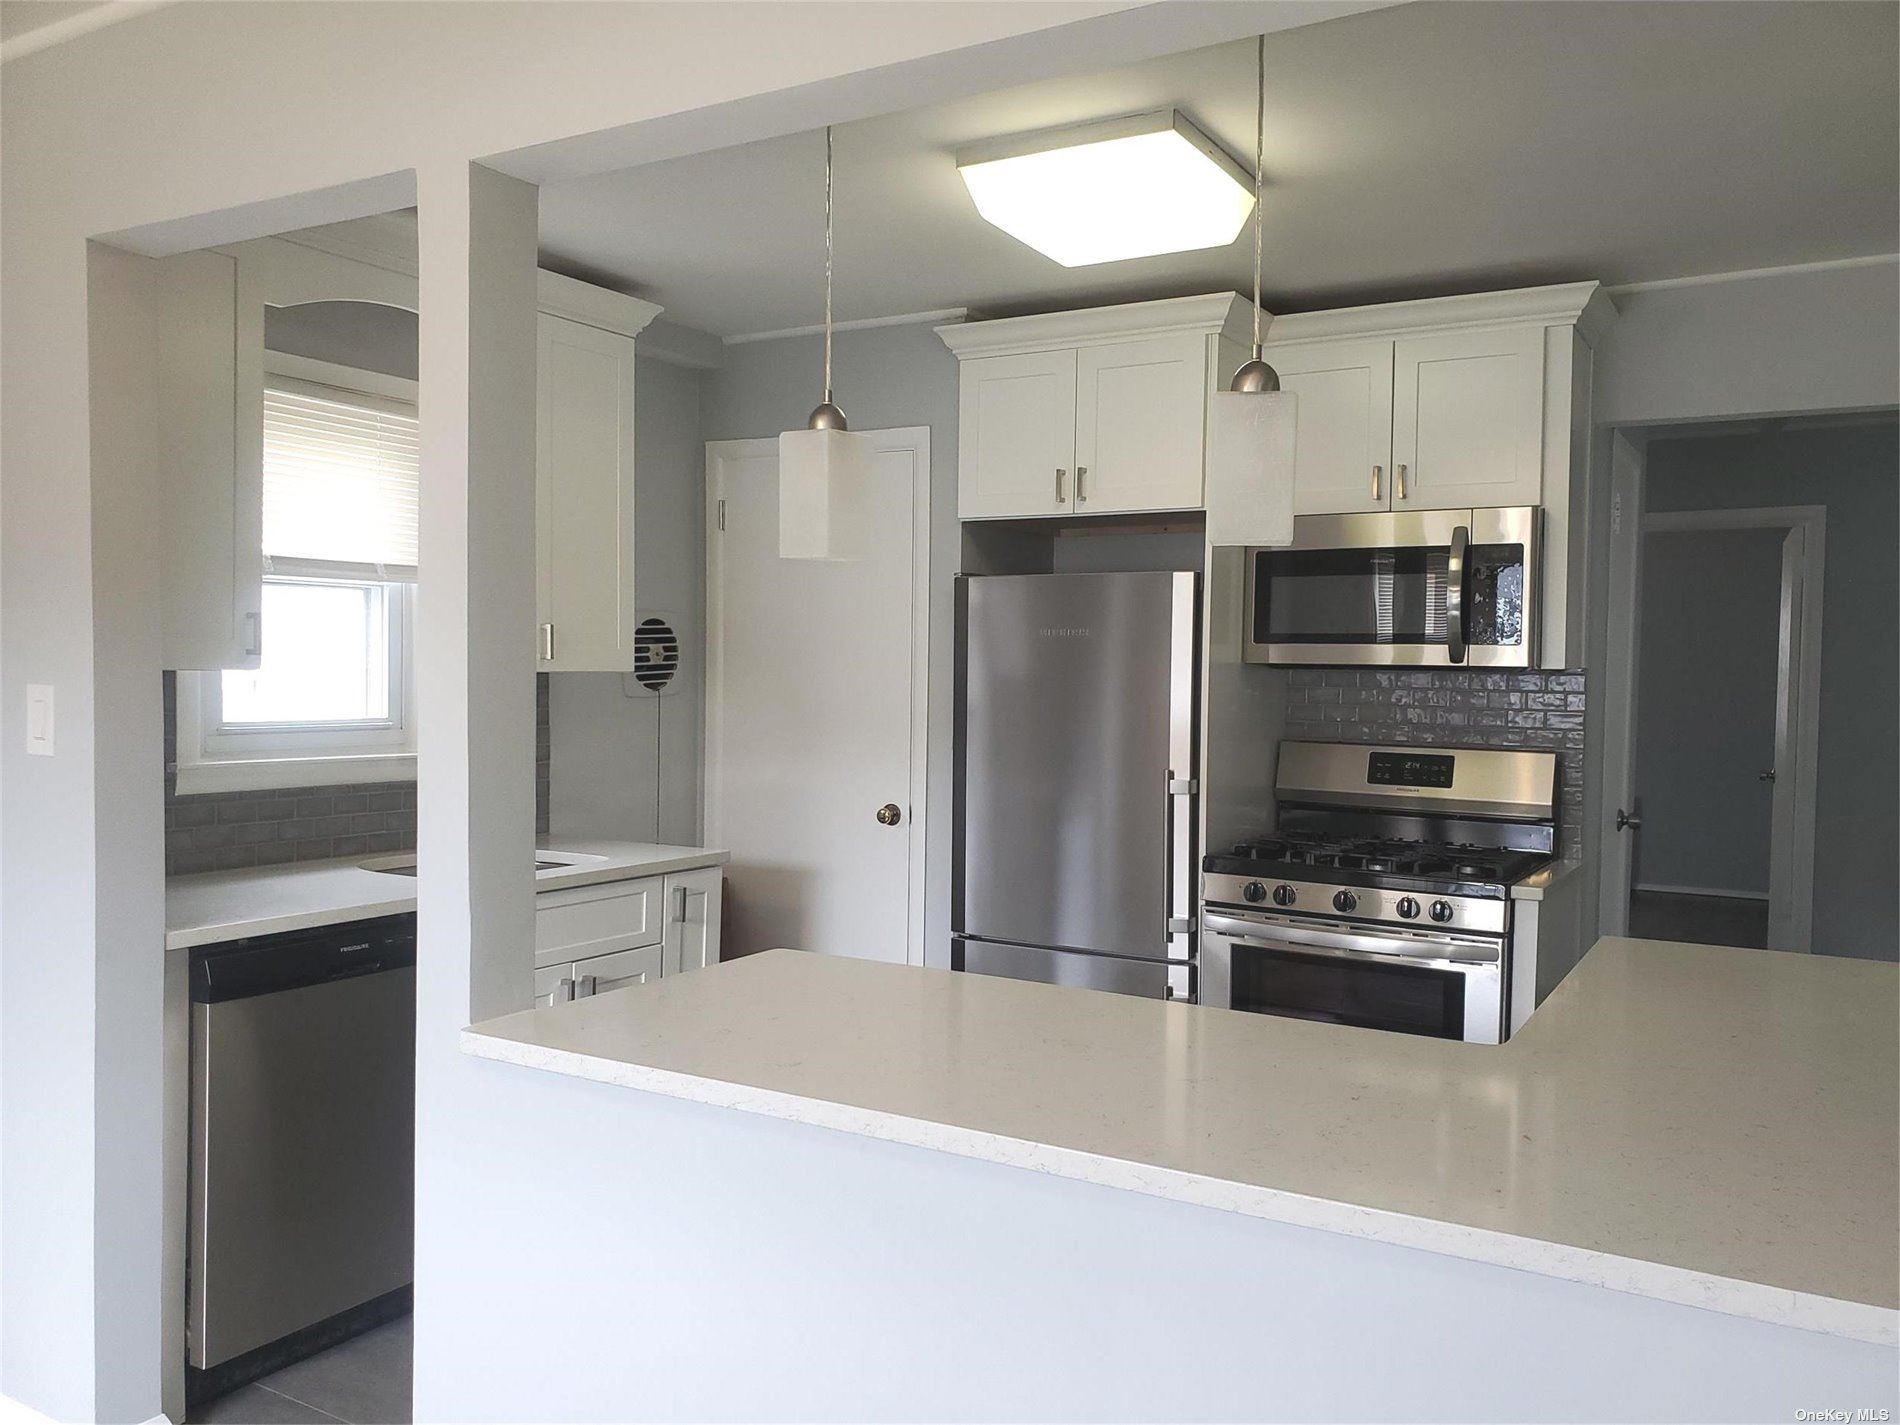 15 Daley Place #1st Fl, Lynbrook, NY 11563 - MLS#: 3300095